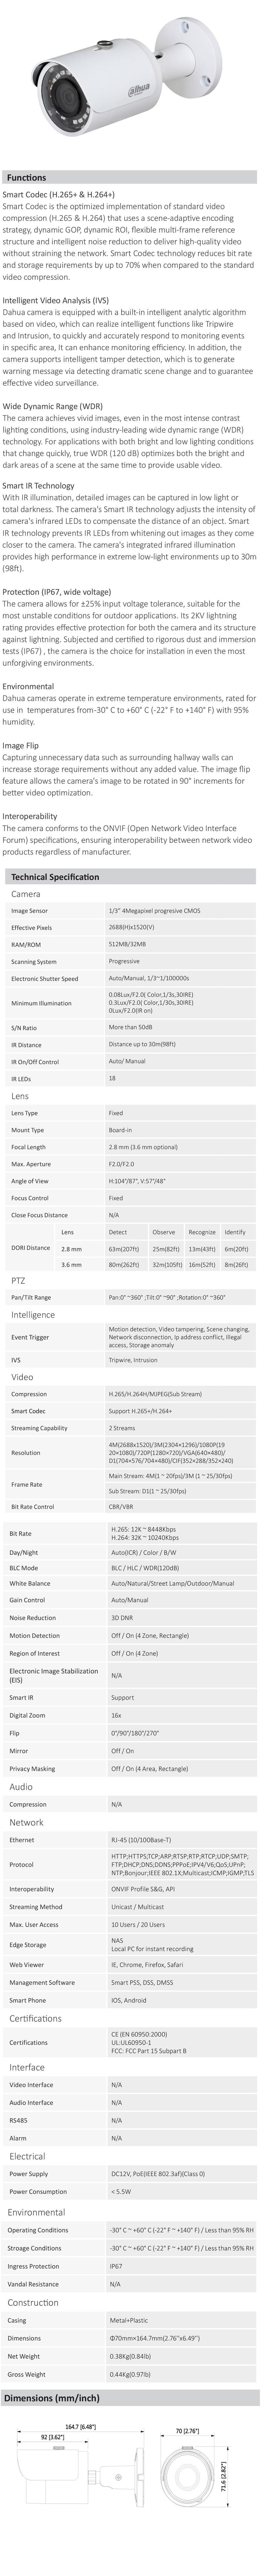 Dahua IPC-HFW1431SP-280B 4MP WDR IR Mini-Bullet Camera - Overview 1